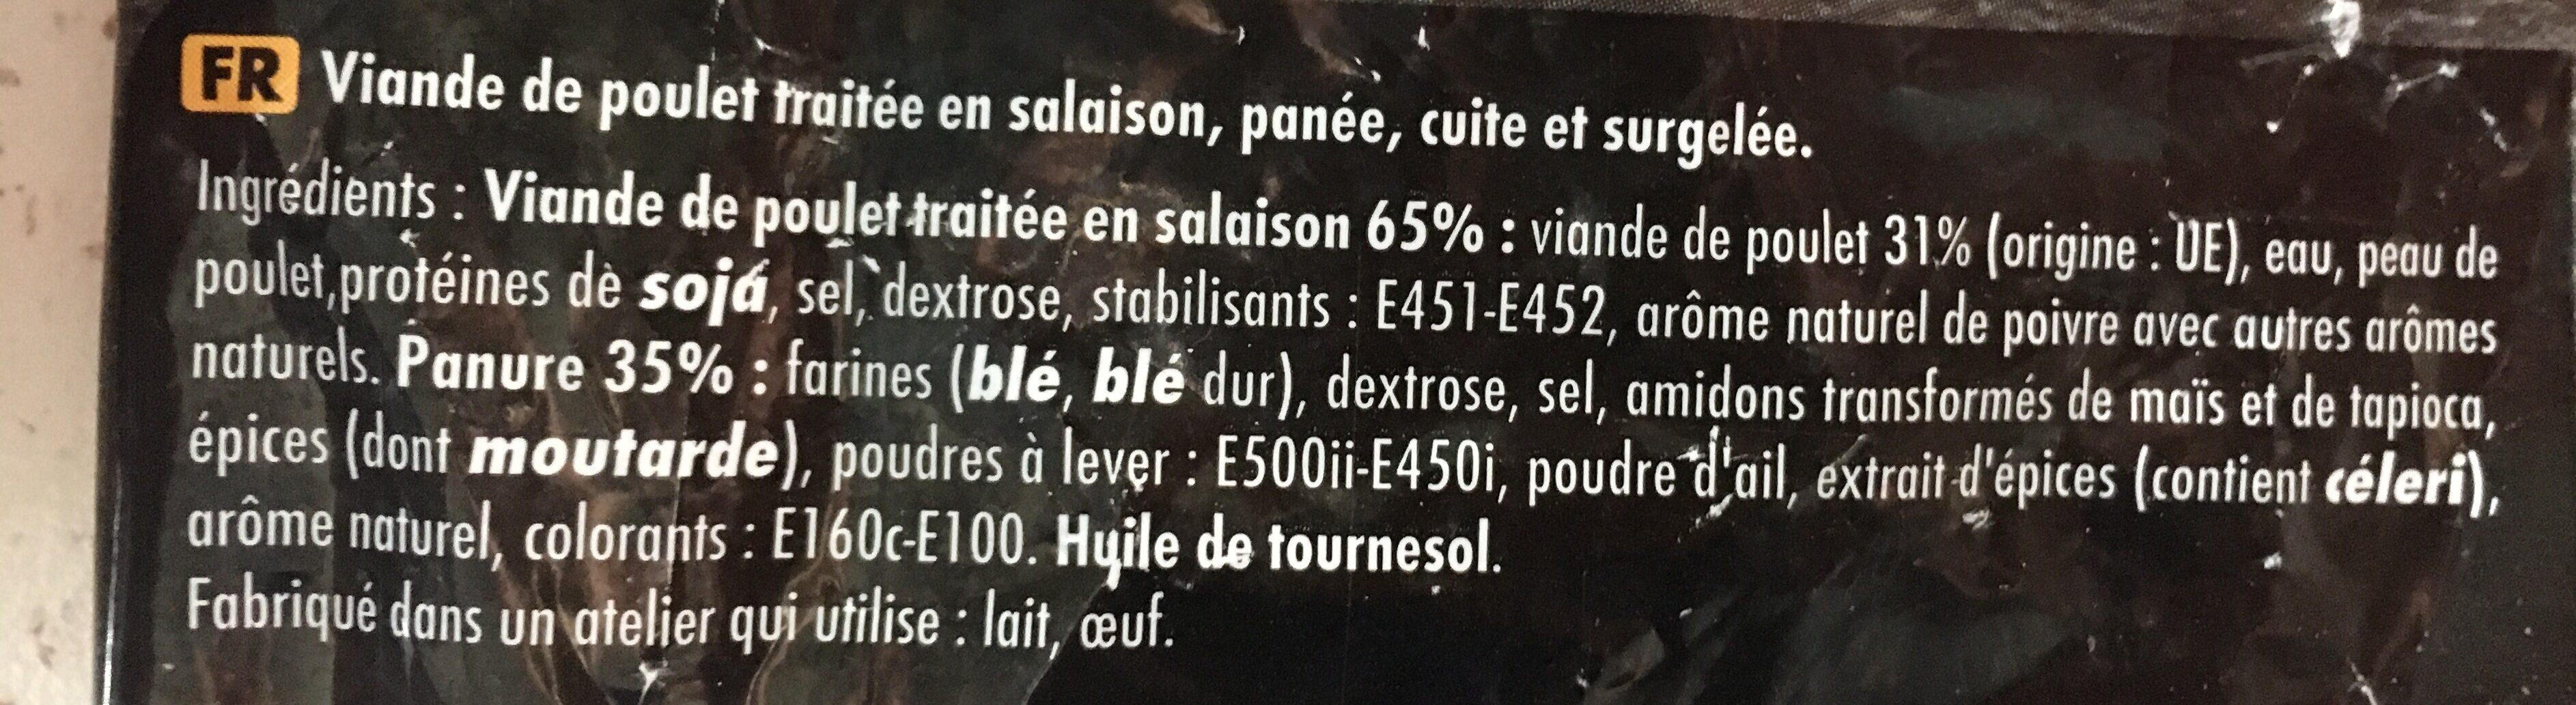 Nuggets de poulet 1 kg - Ingrediënten - fr